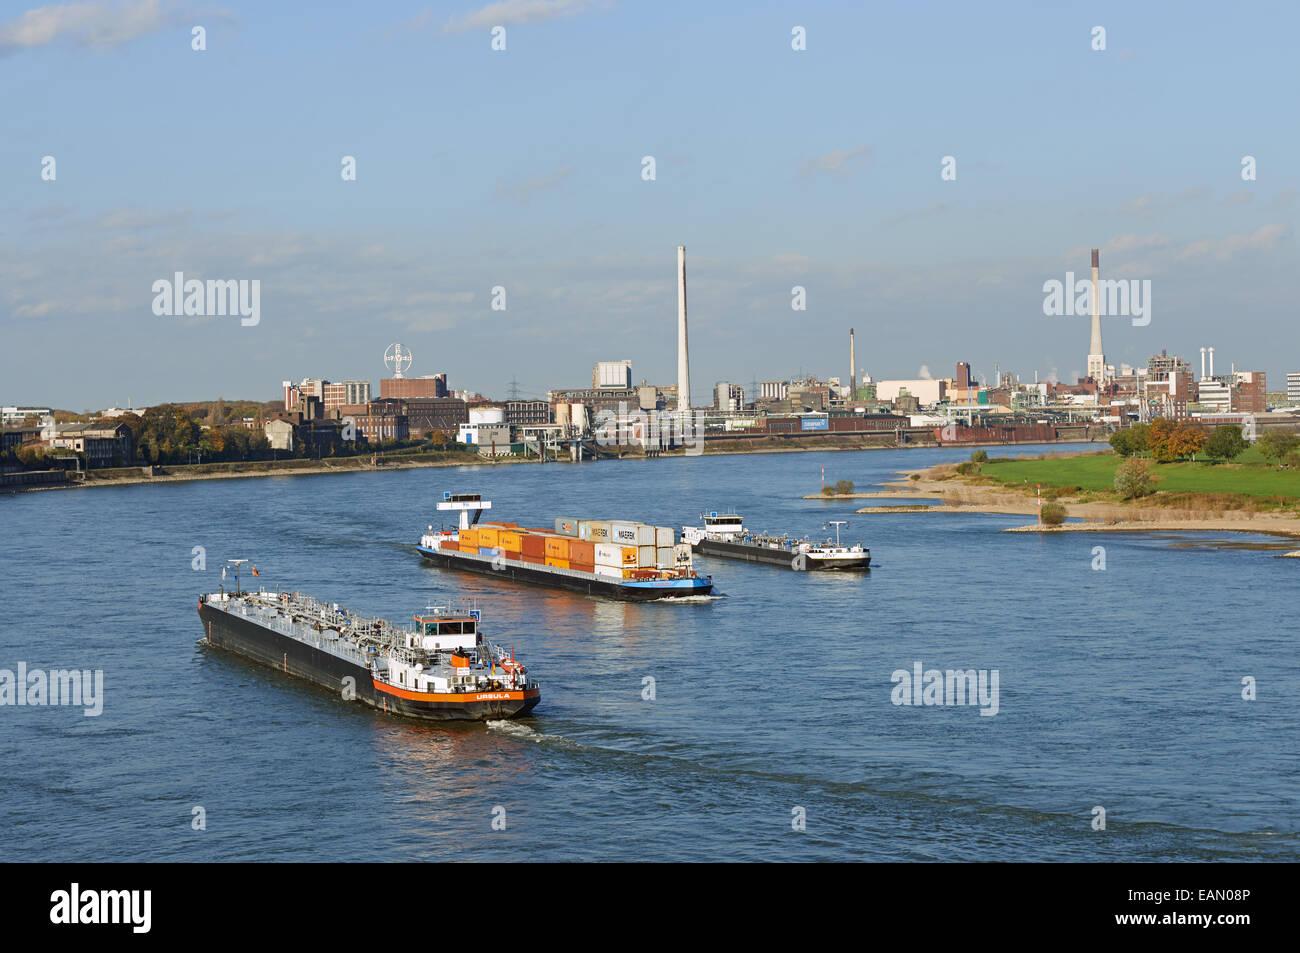 Commercial shipping river Rhine, Krefeld, North Rhine-Westphalia, Germany. - Stock Image